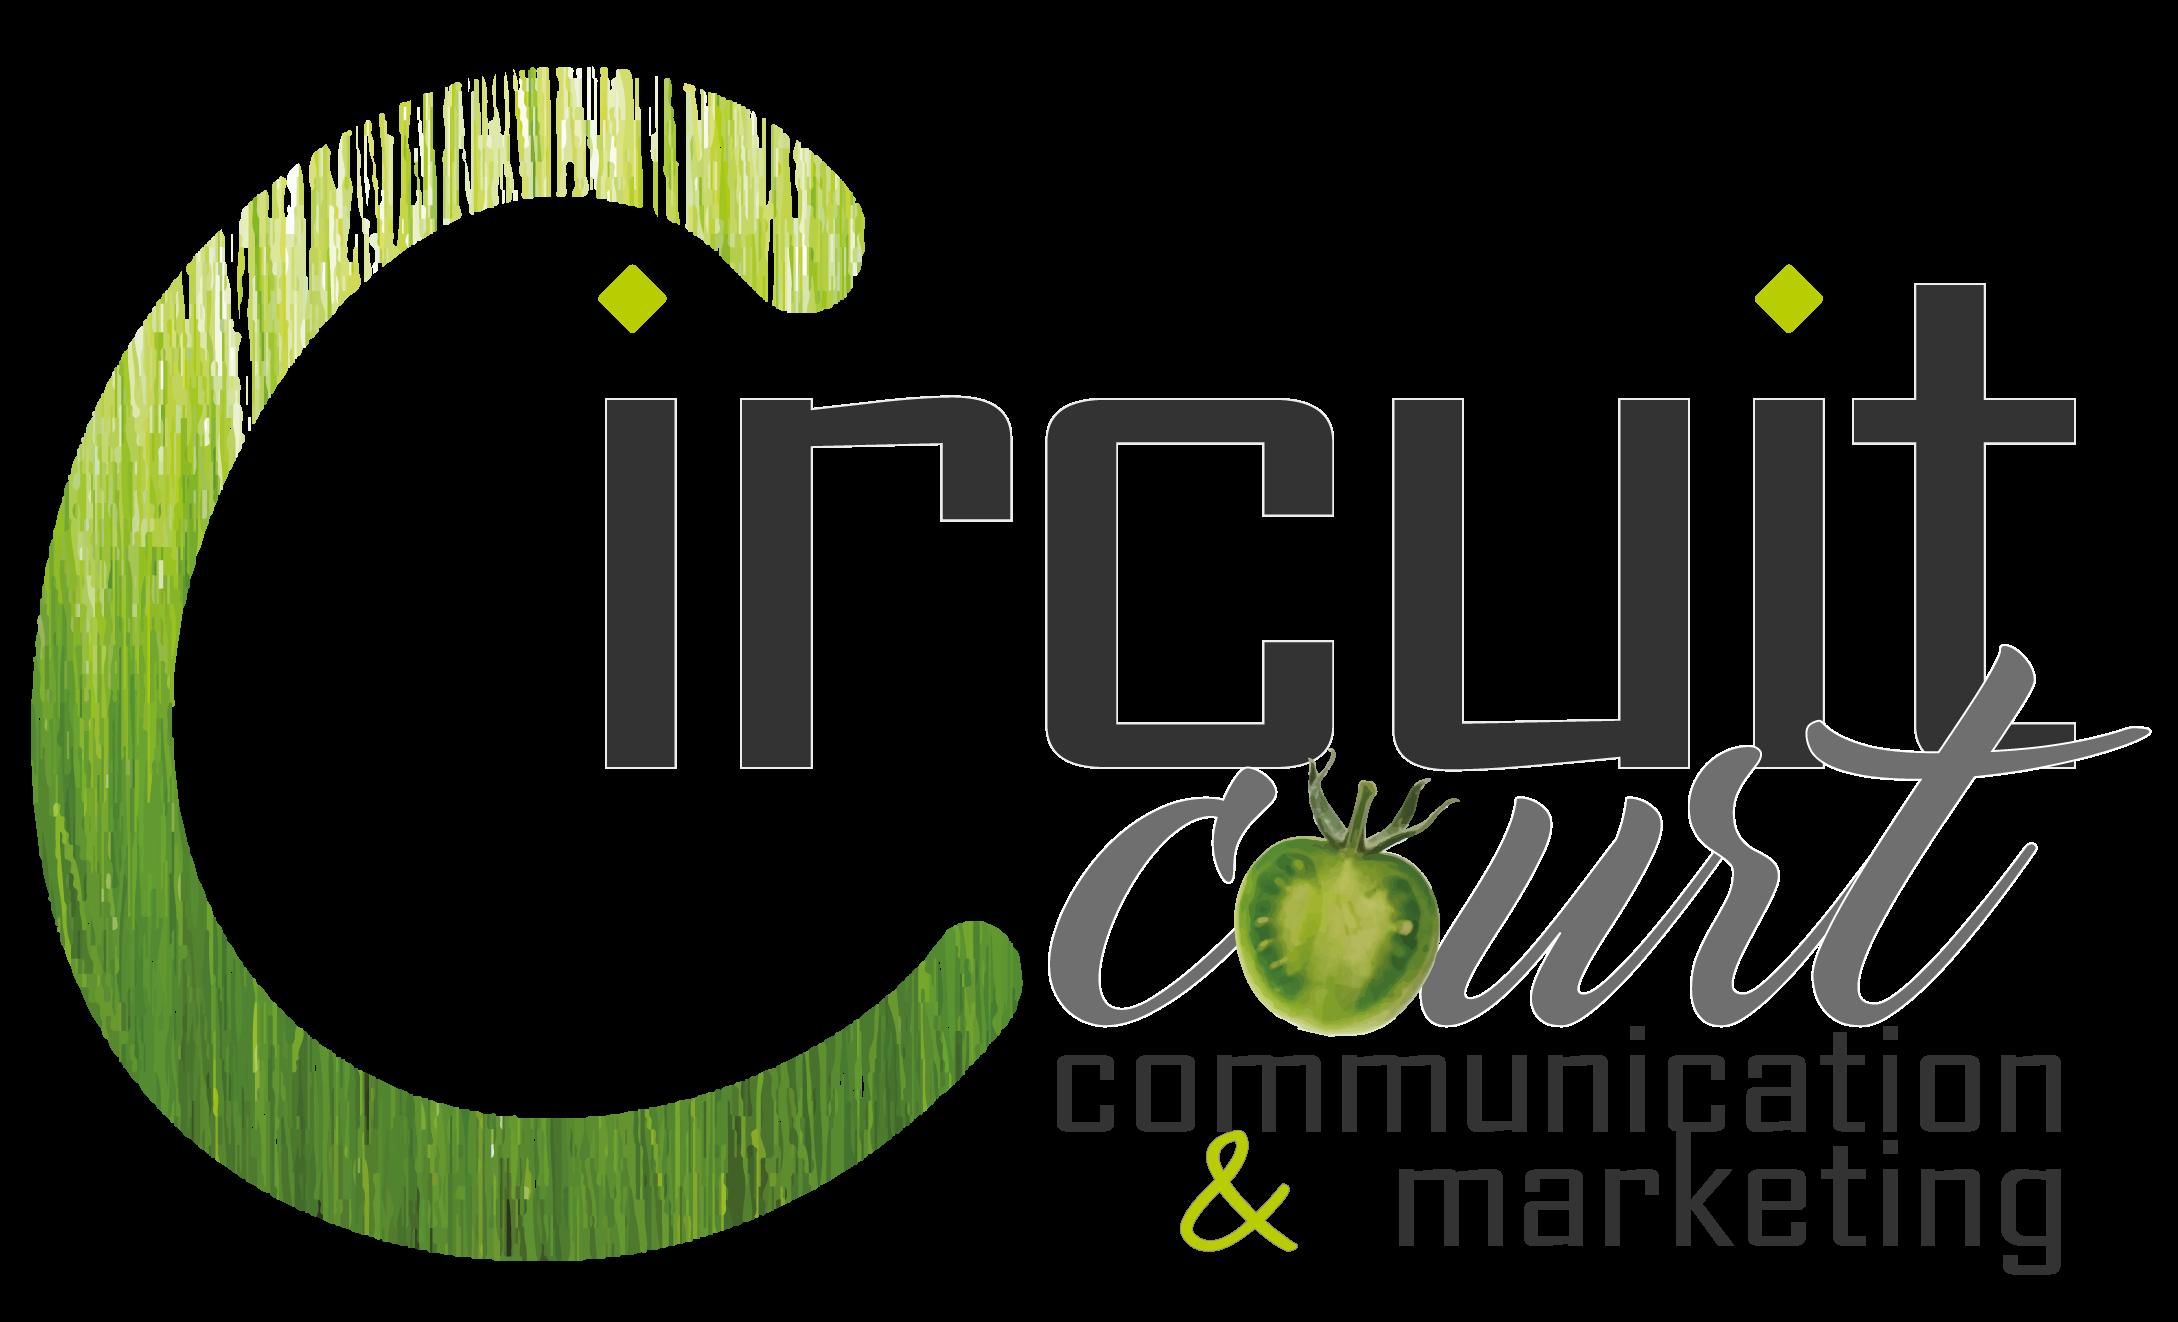 Circuit Court Communication